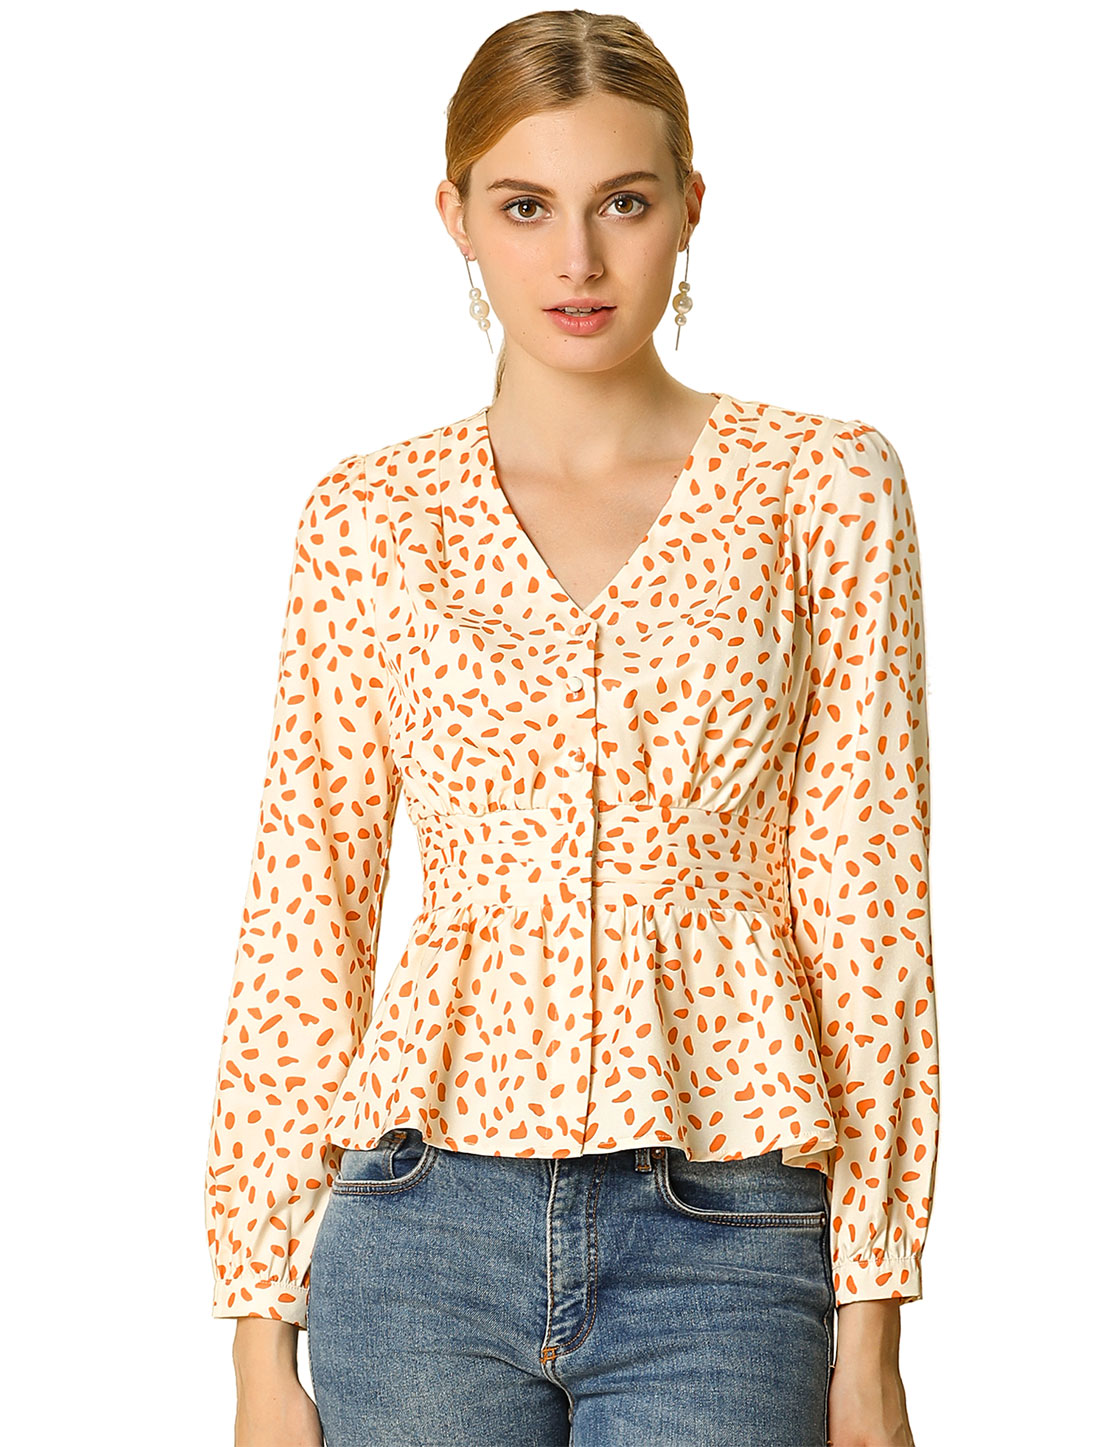 Allegra K Women's Dots V Neck Blouse Smocked Peplum Top Beige XS